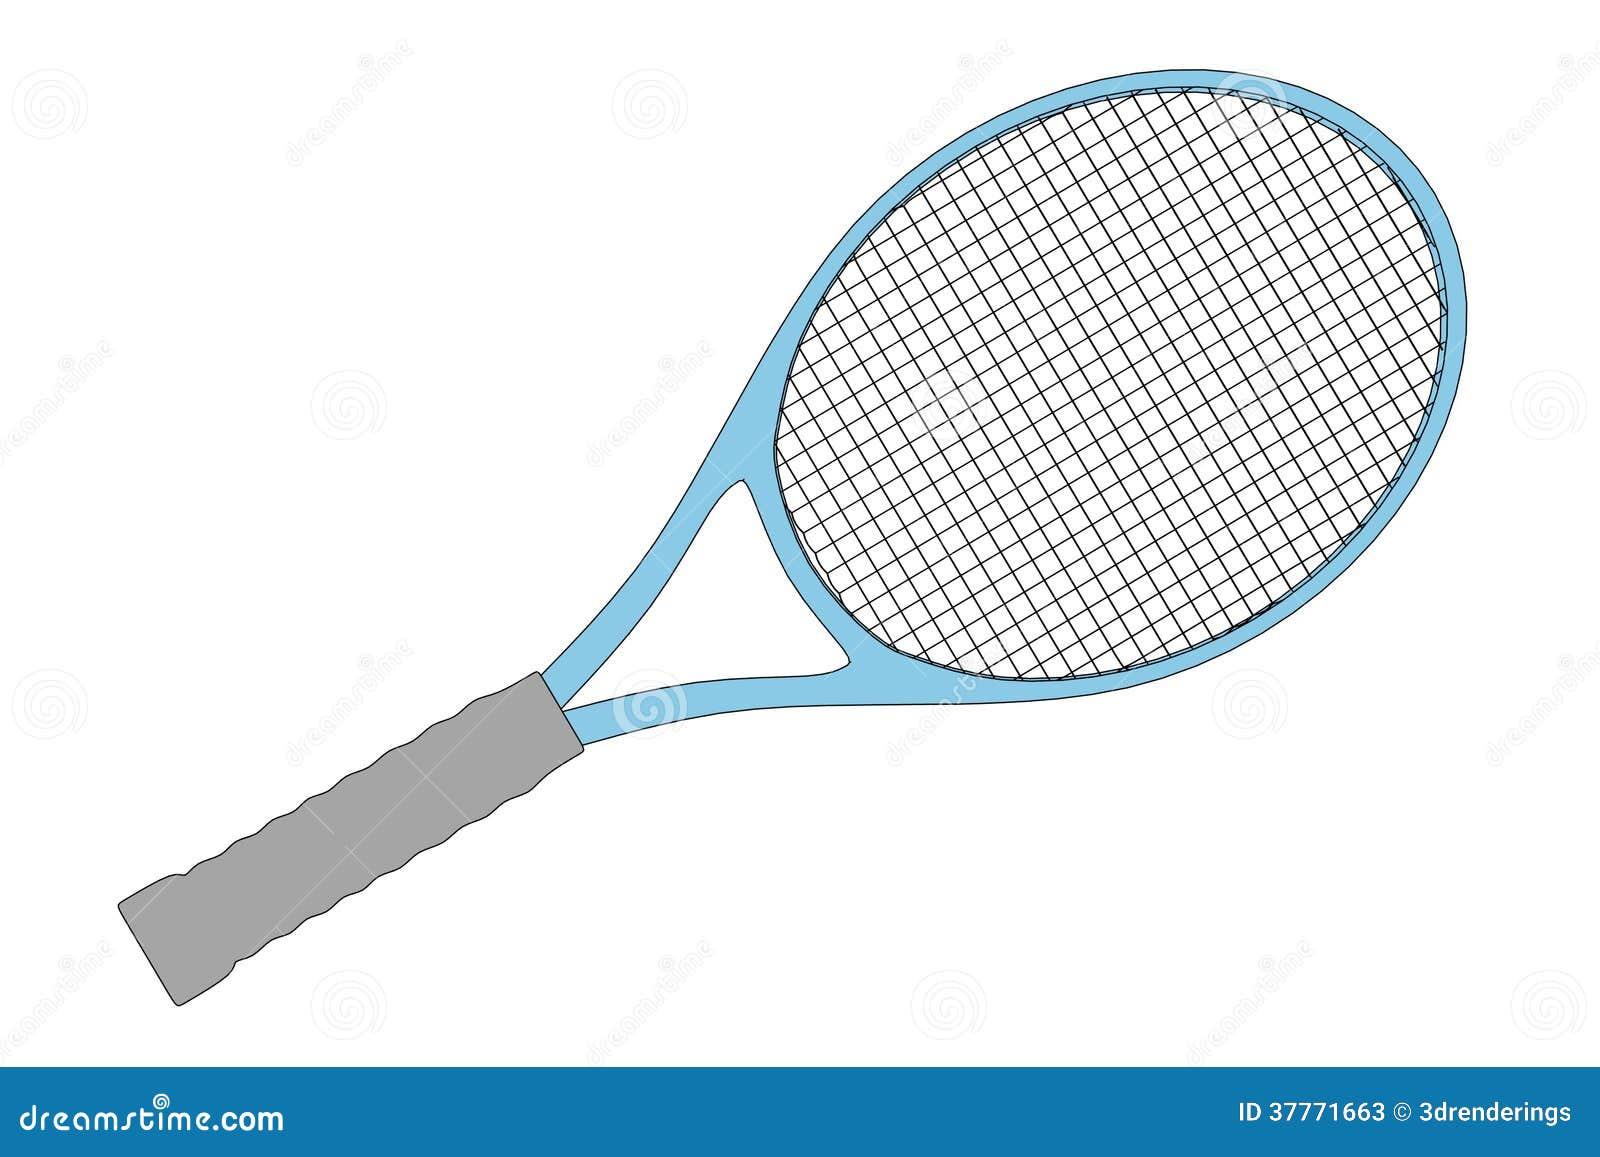 Image of tennis racket stock illustration illustration of - Raquette dessin ...